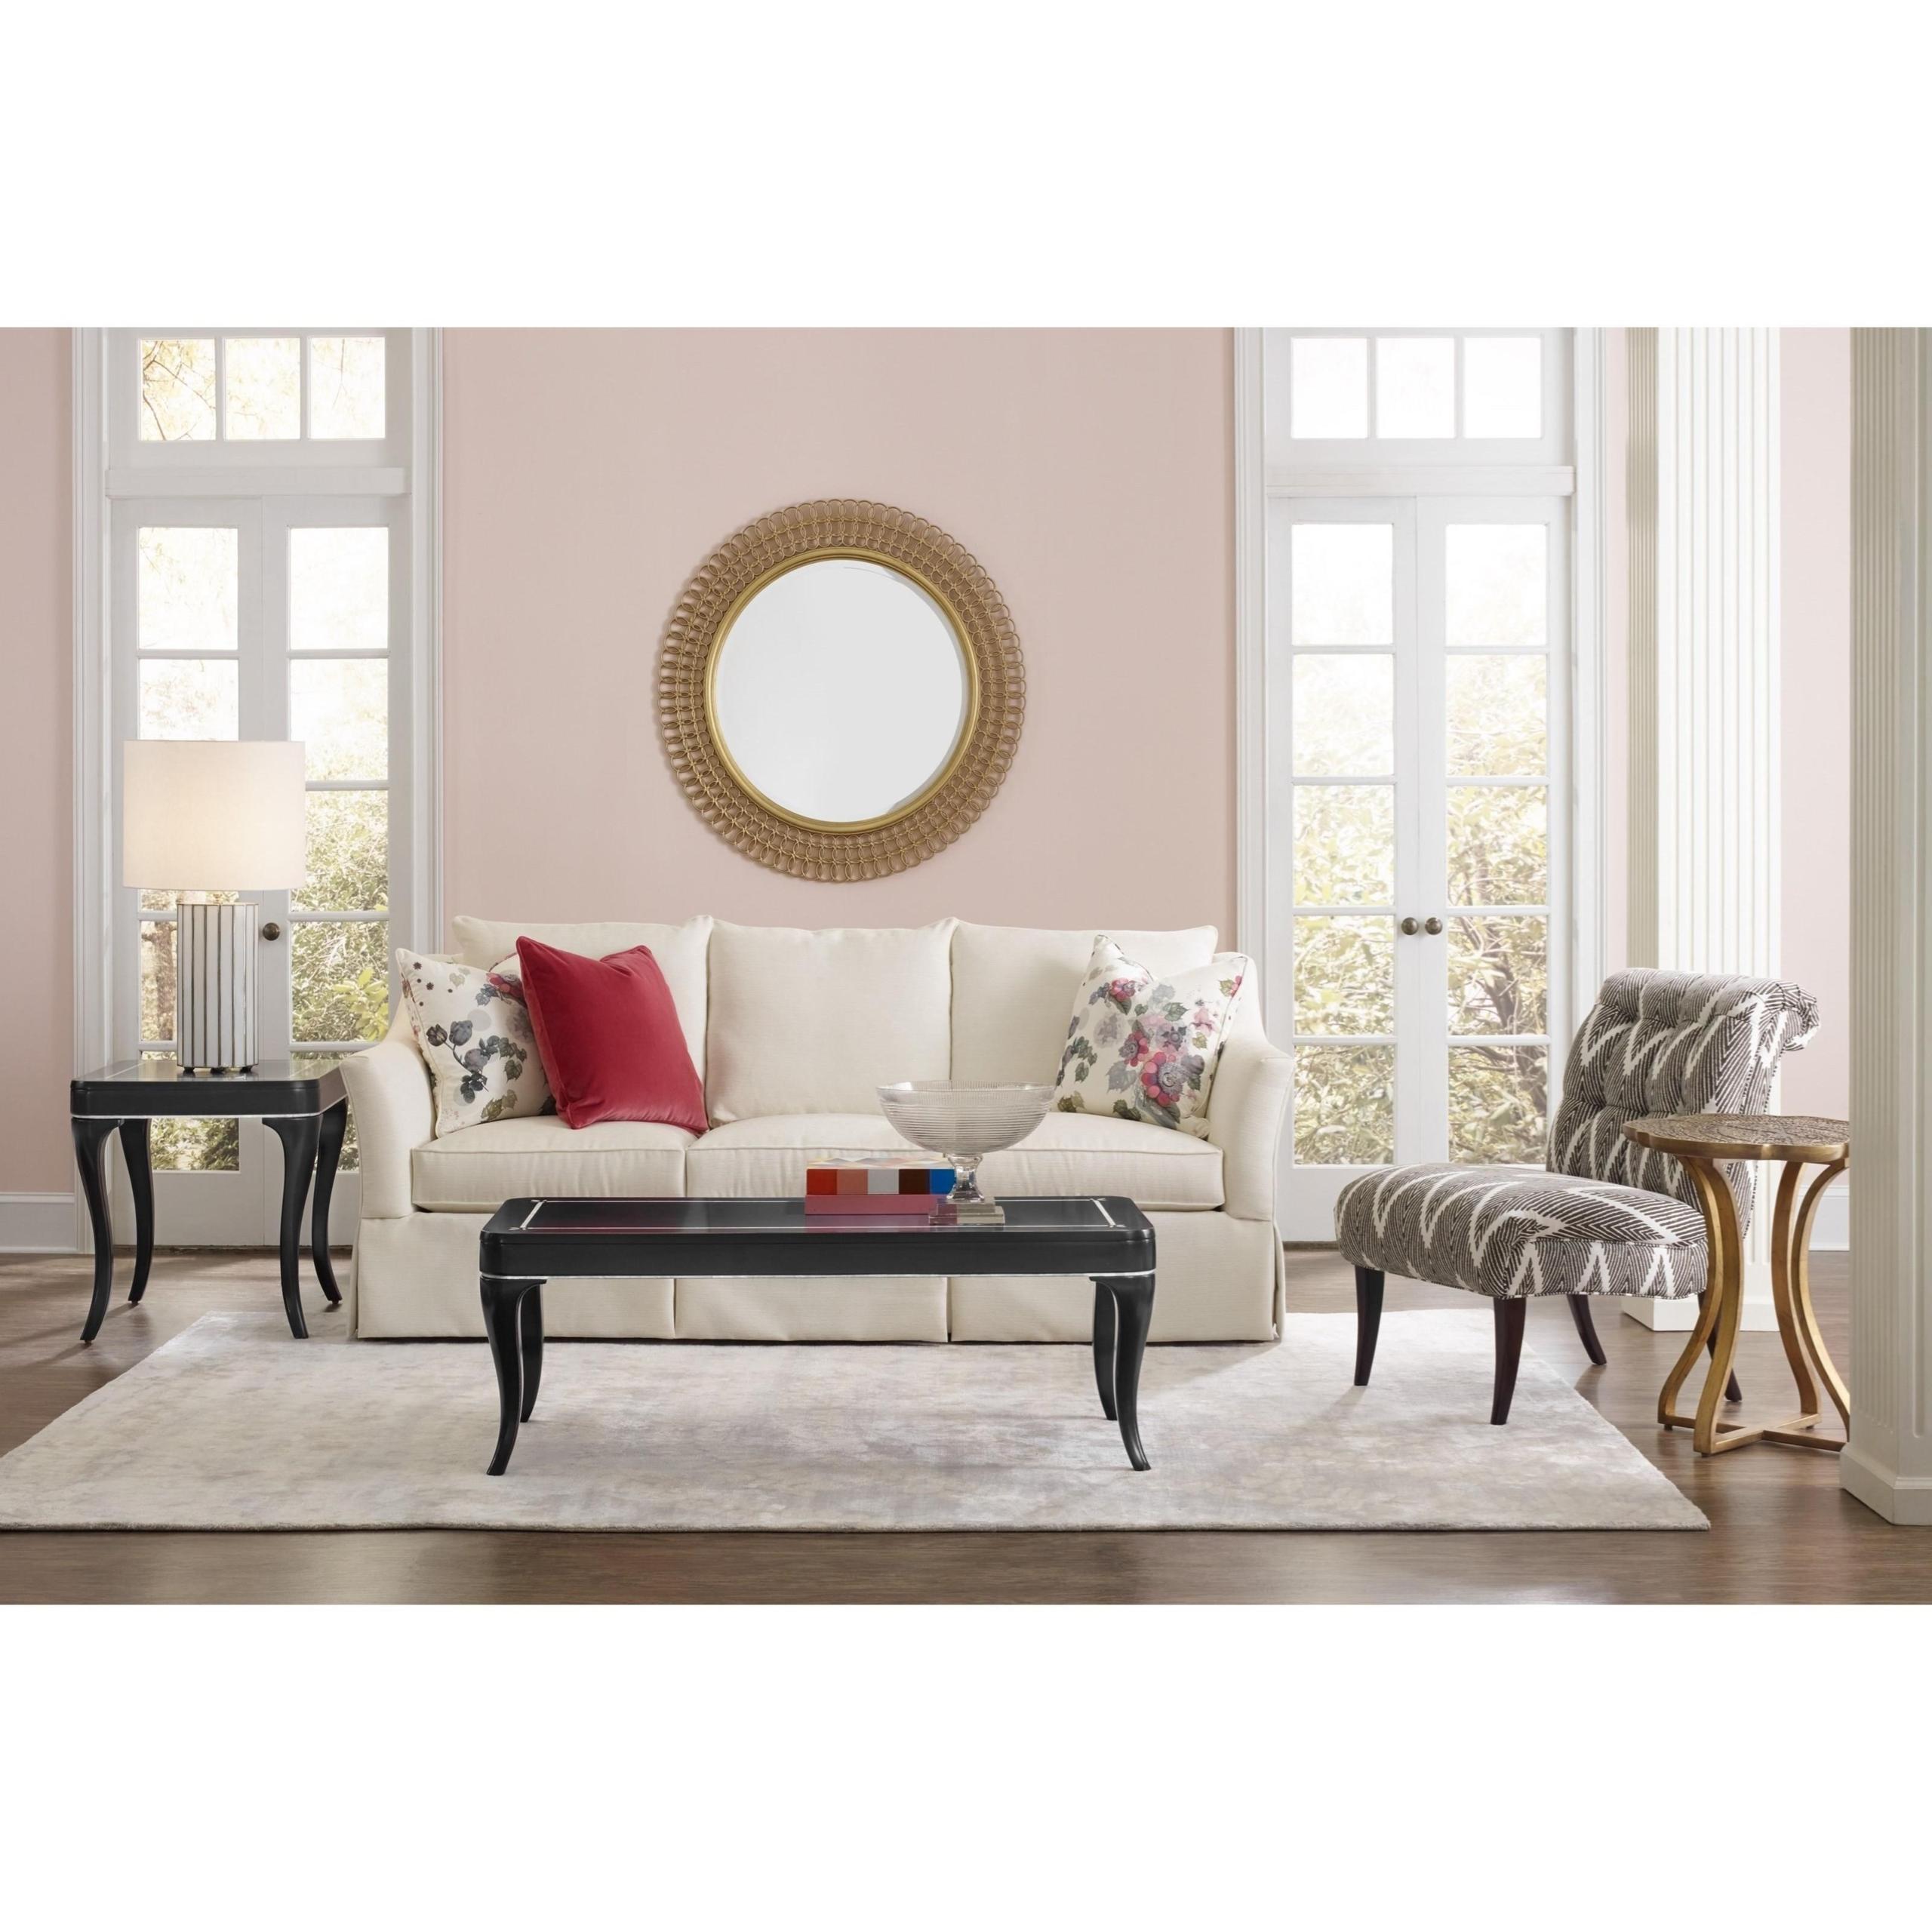 Cynthia Rowley Home Decor You Ll Love In 2021 Visualhunt